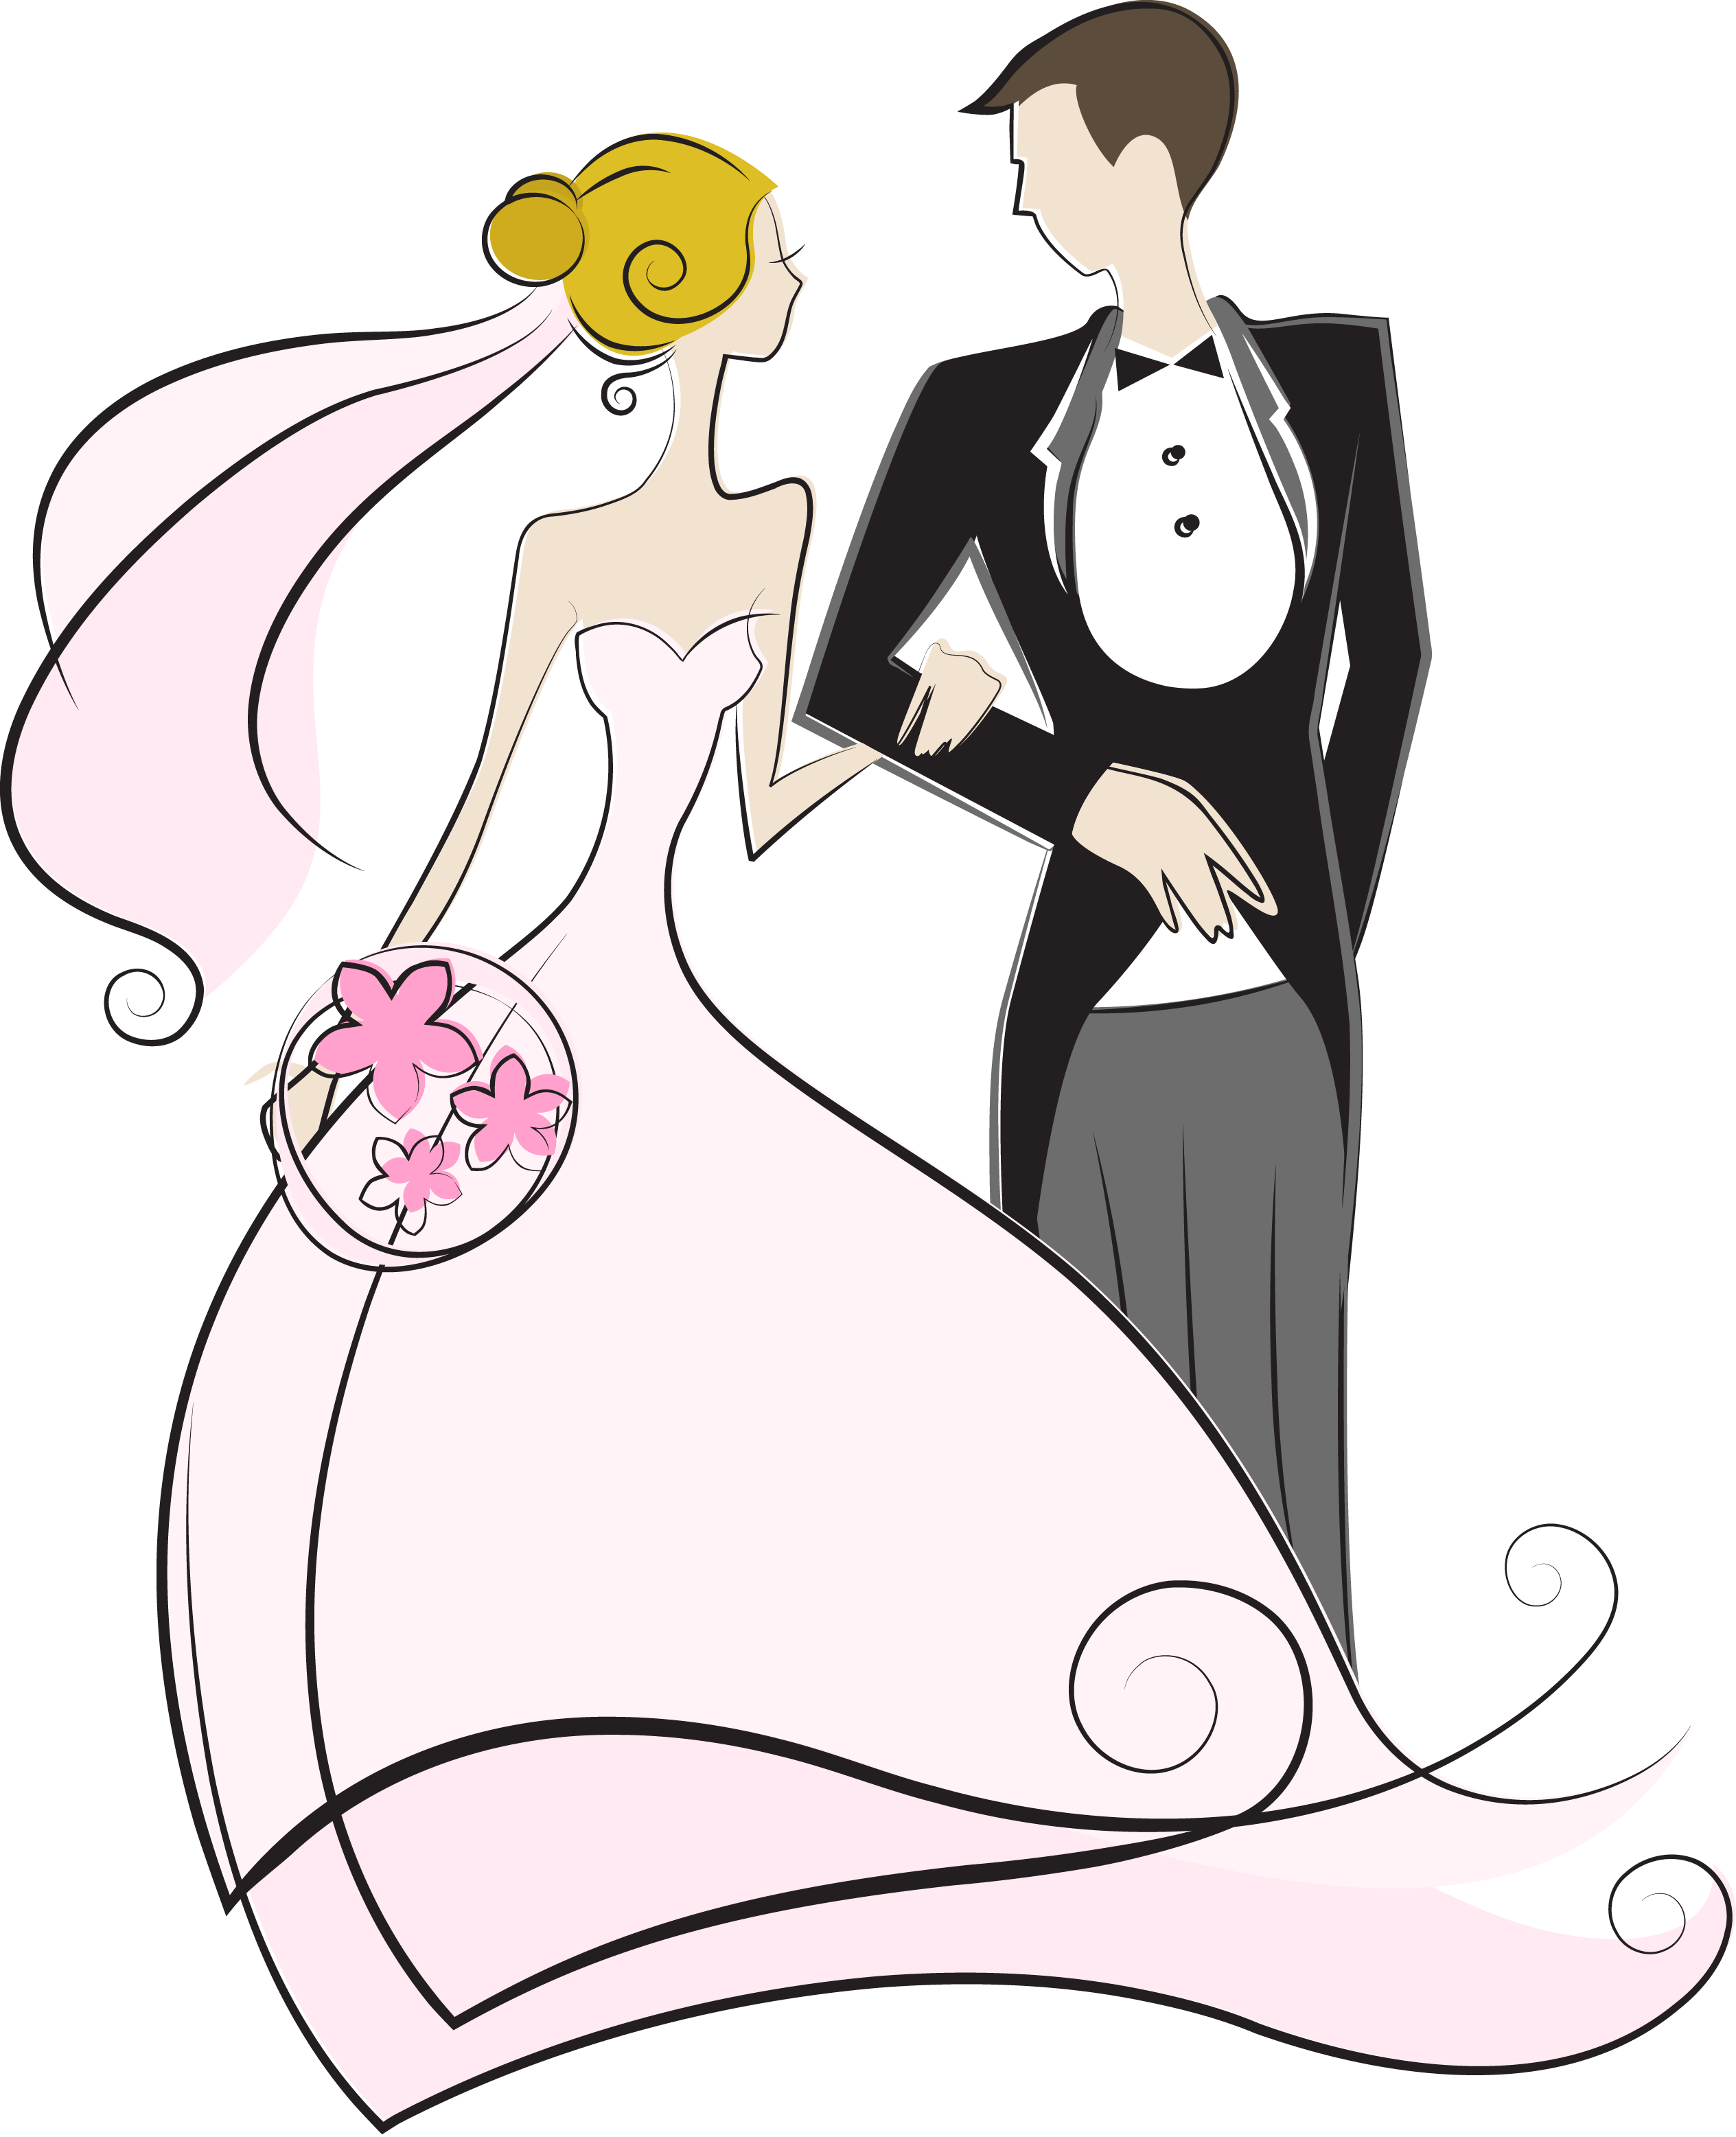 Wedding Couple Clipart Png: Pin By Dara Tata On СВАДЬБА - жених и невеста